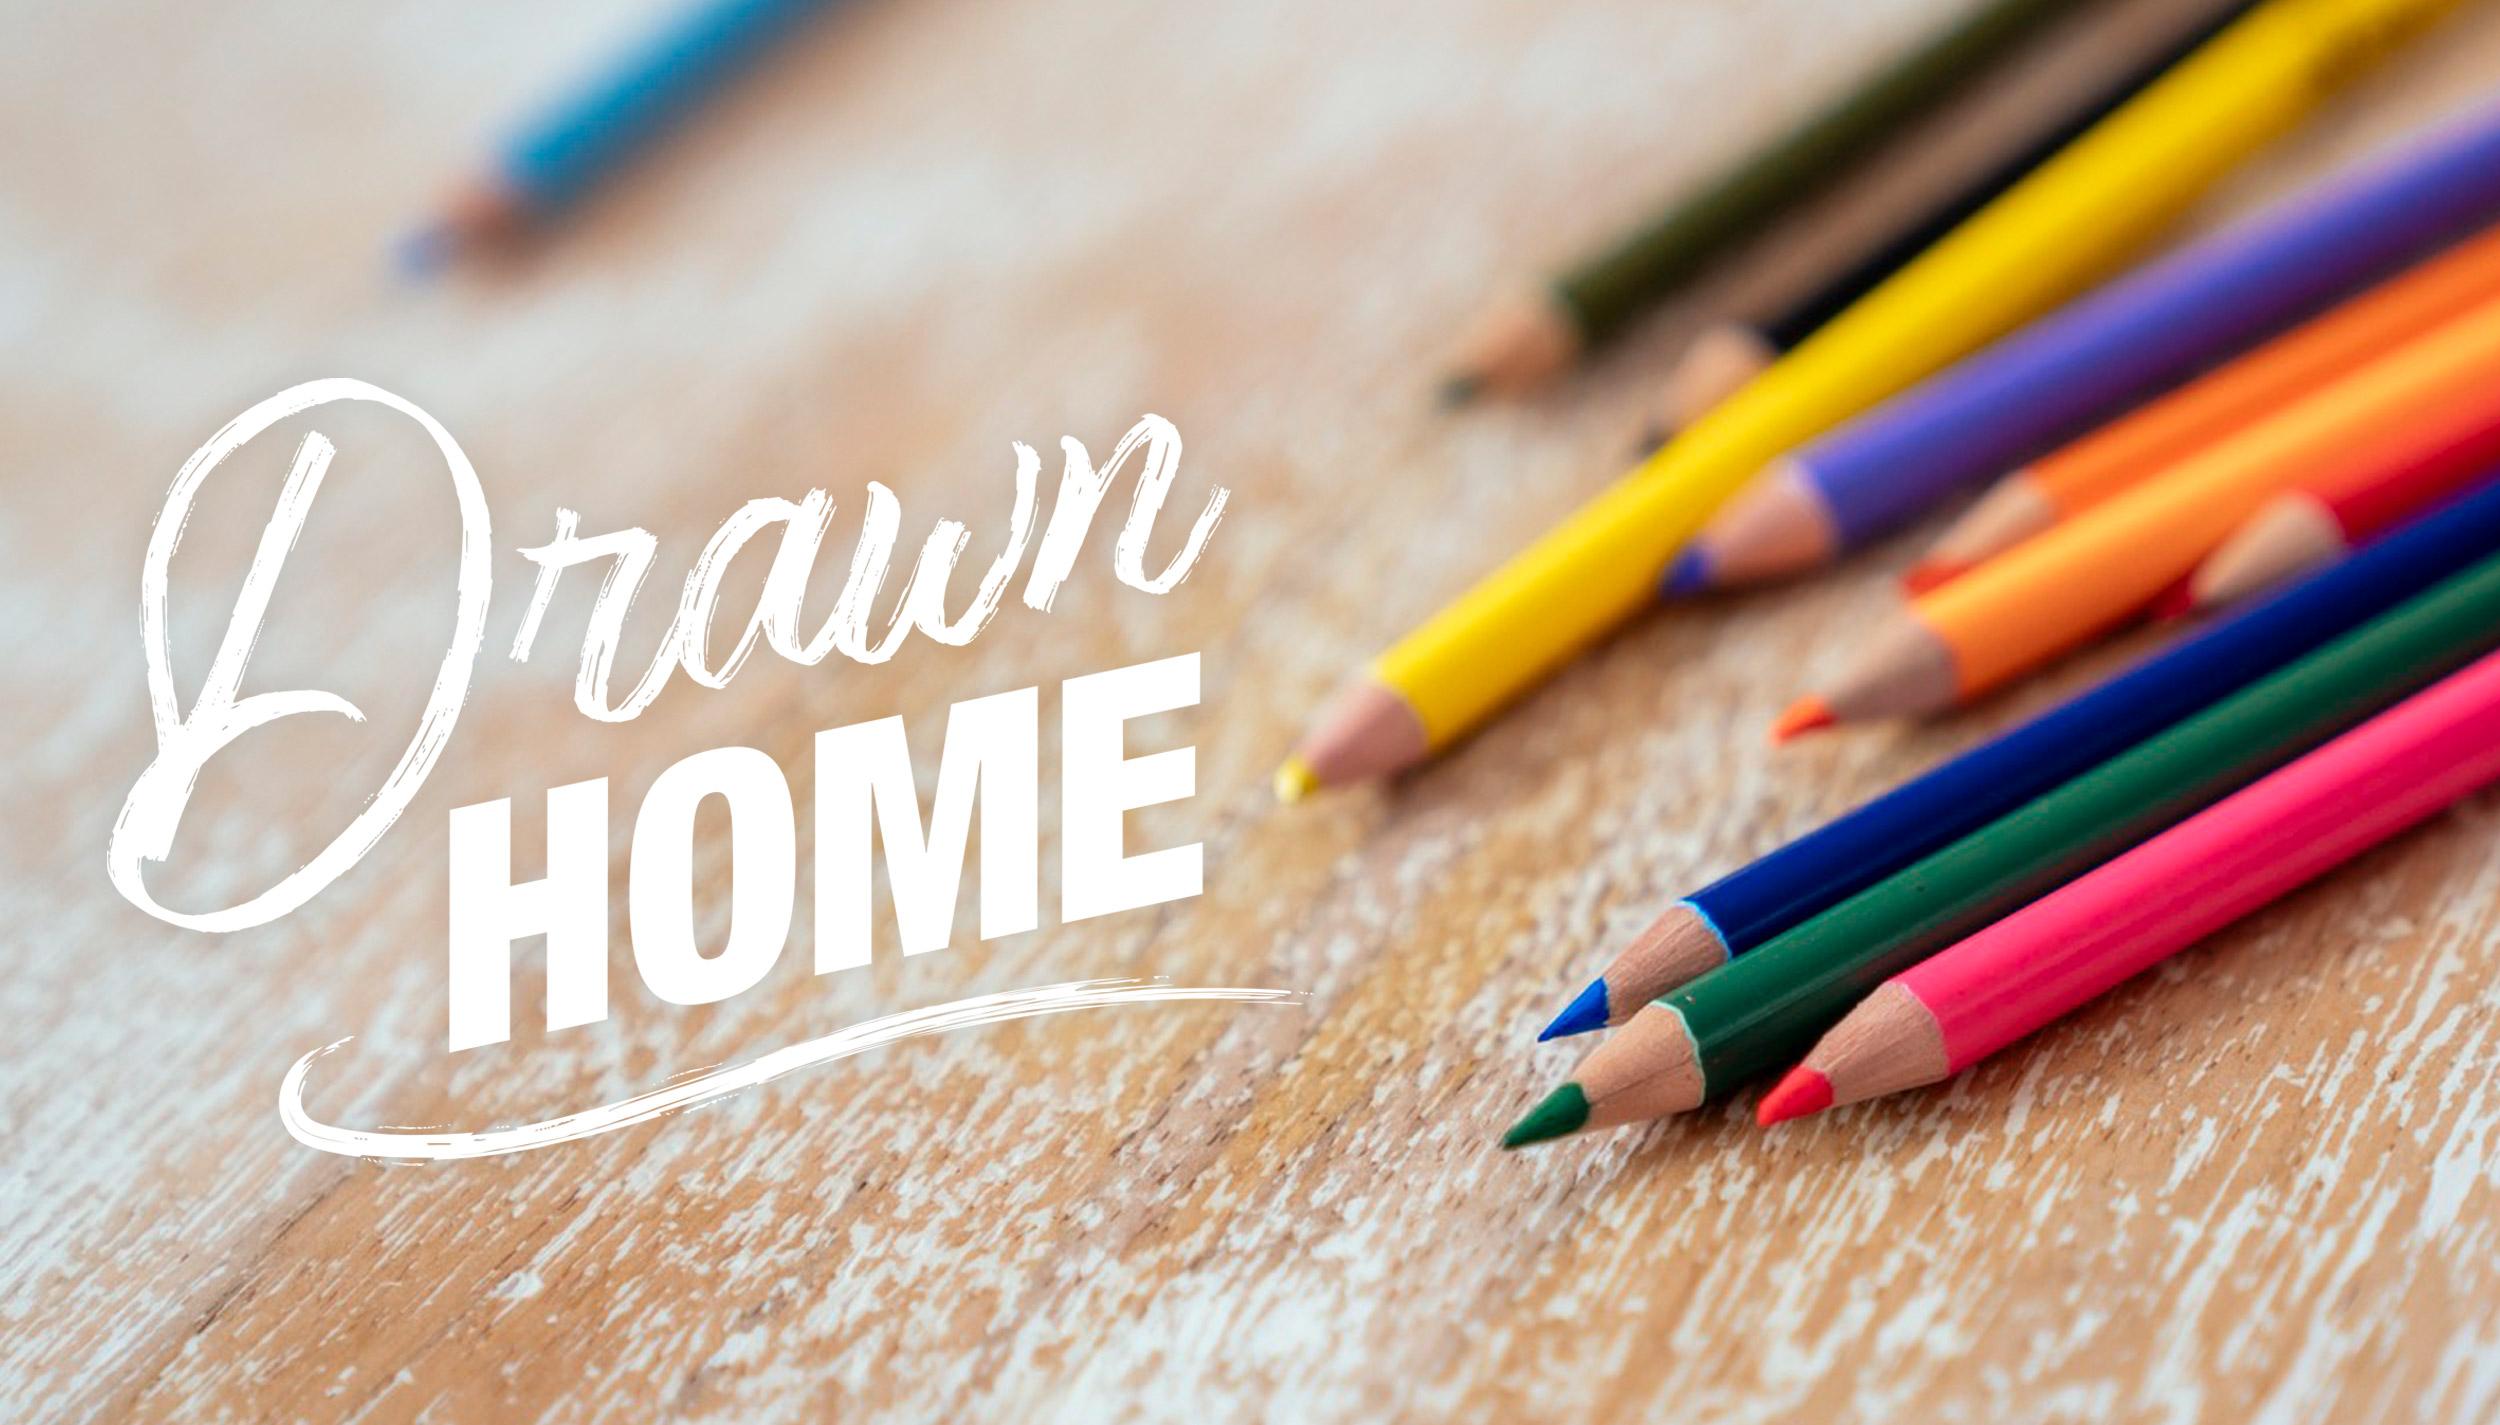 bf_drawn_home_lockup_and_pencils.jpg